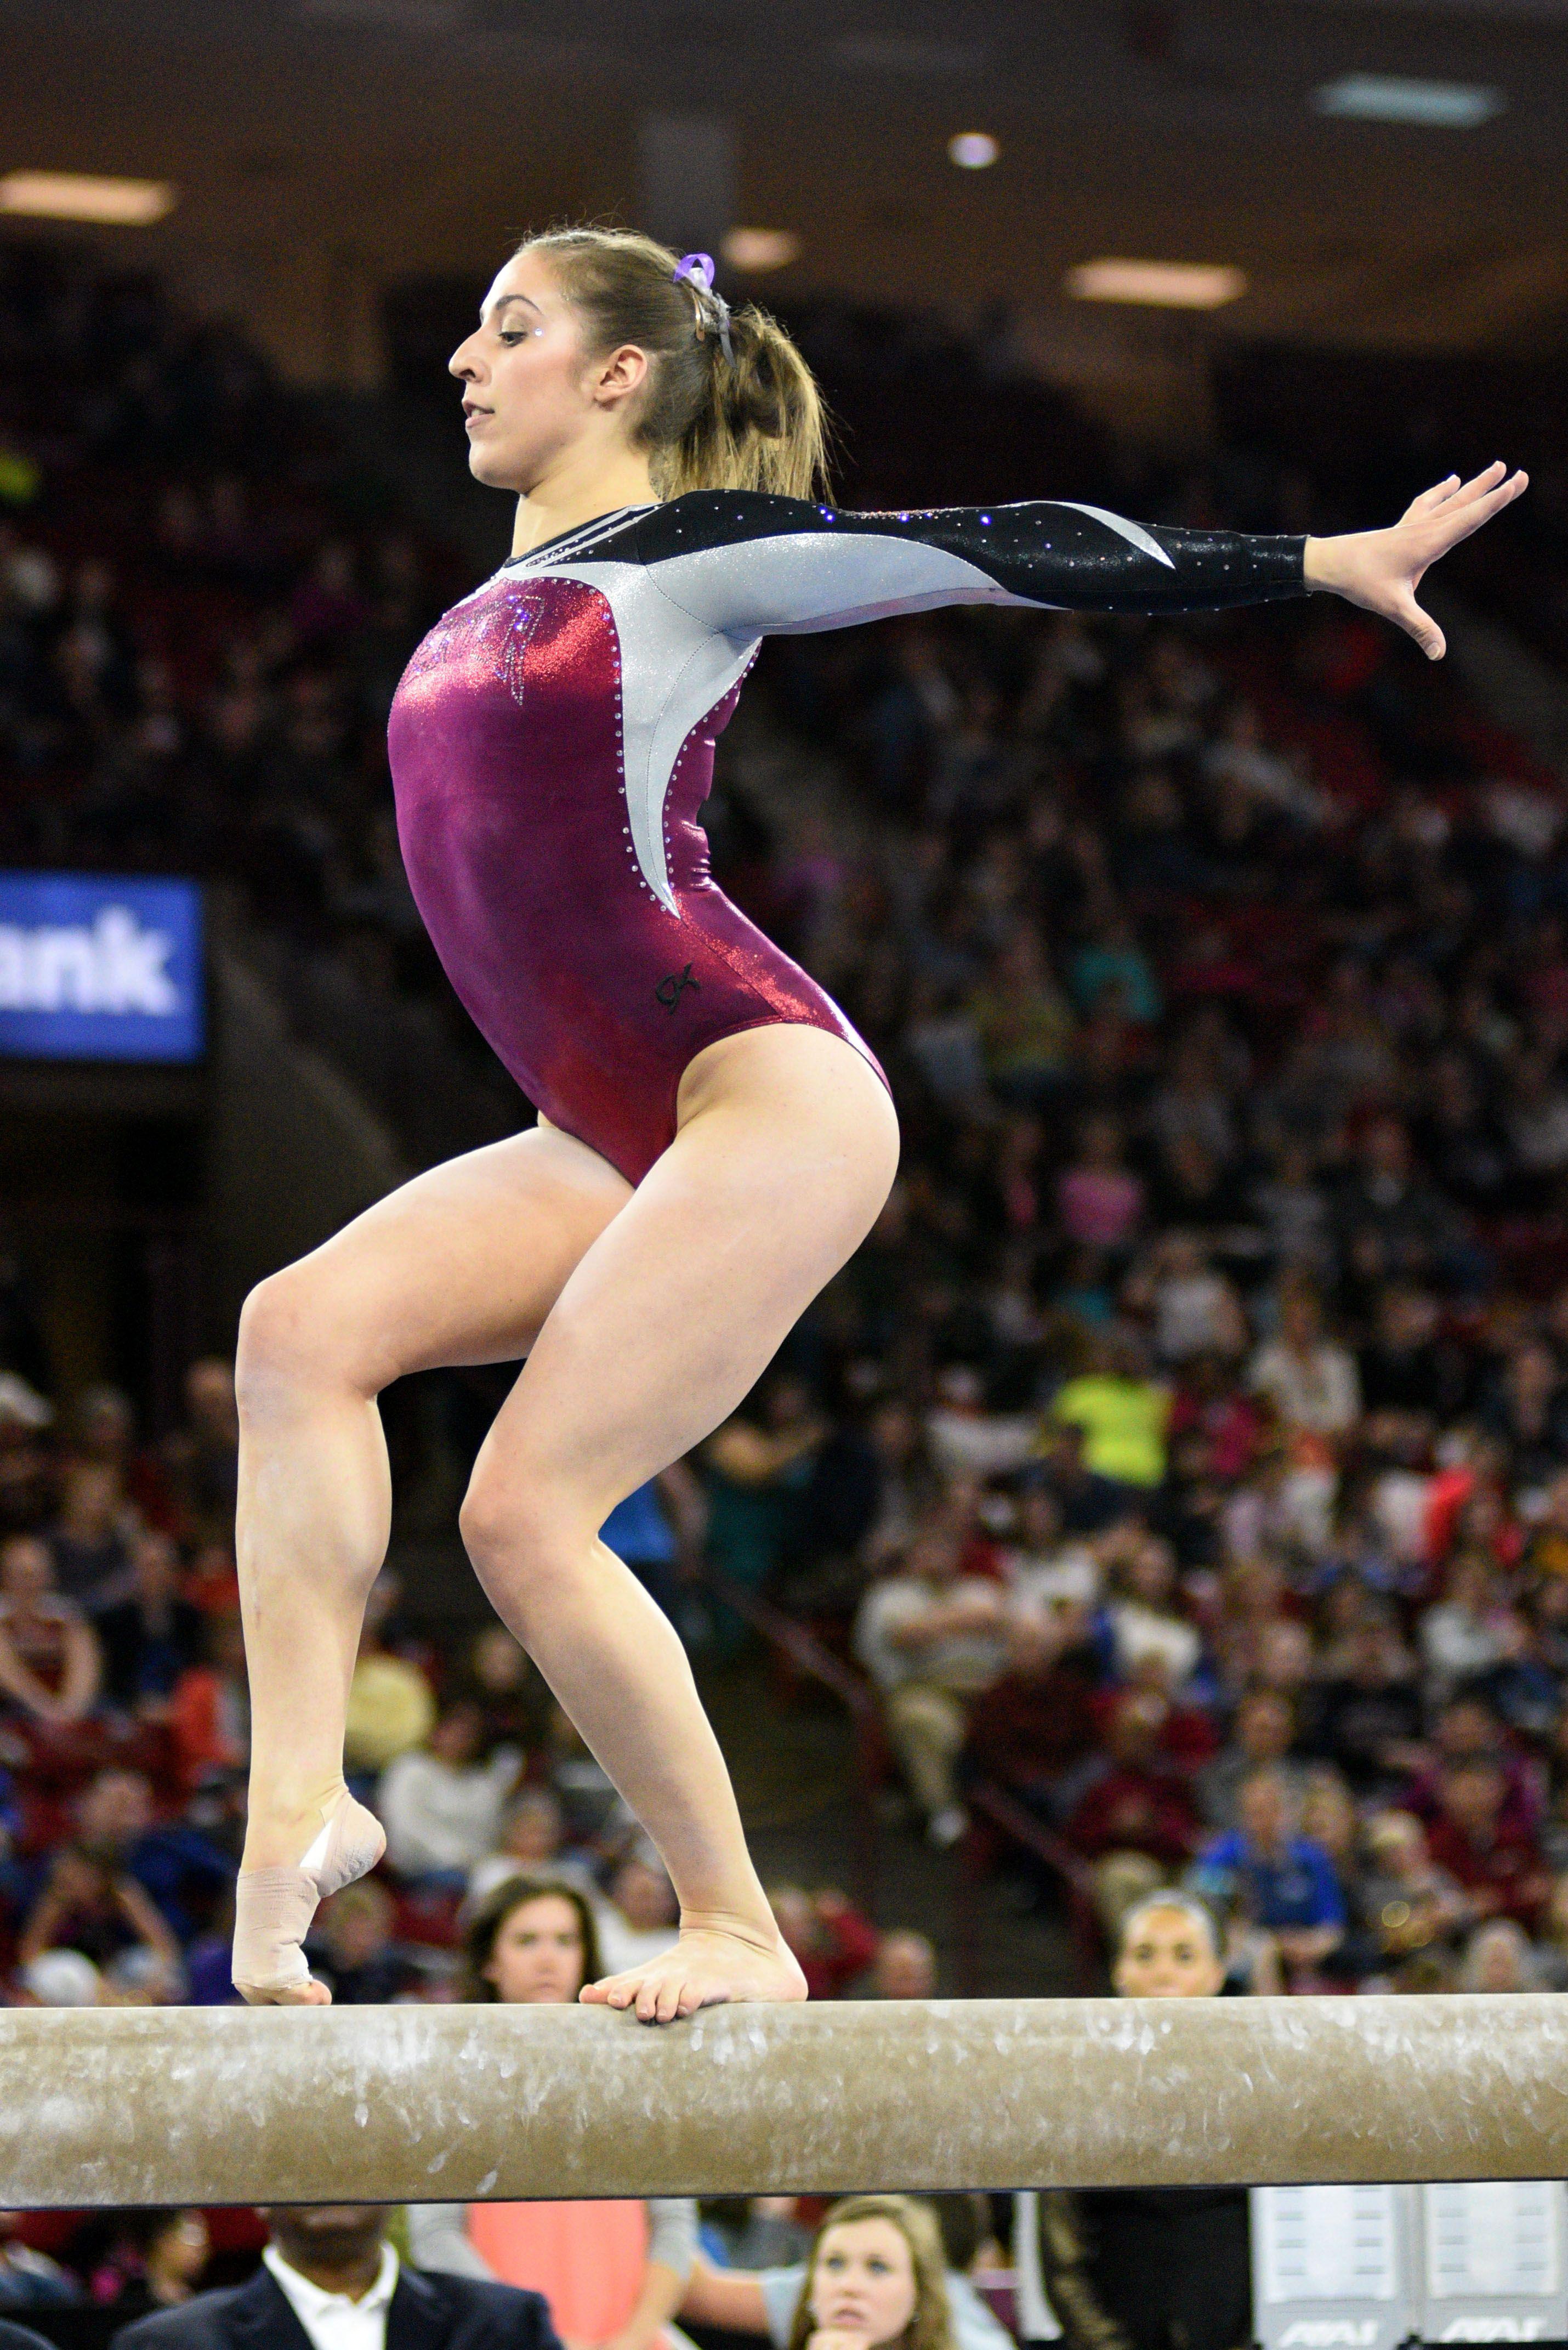 University Of Denver Gymnast Alix Angelopulo Holds A Pose